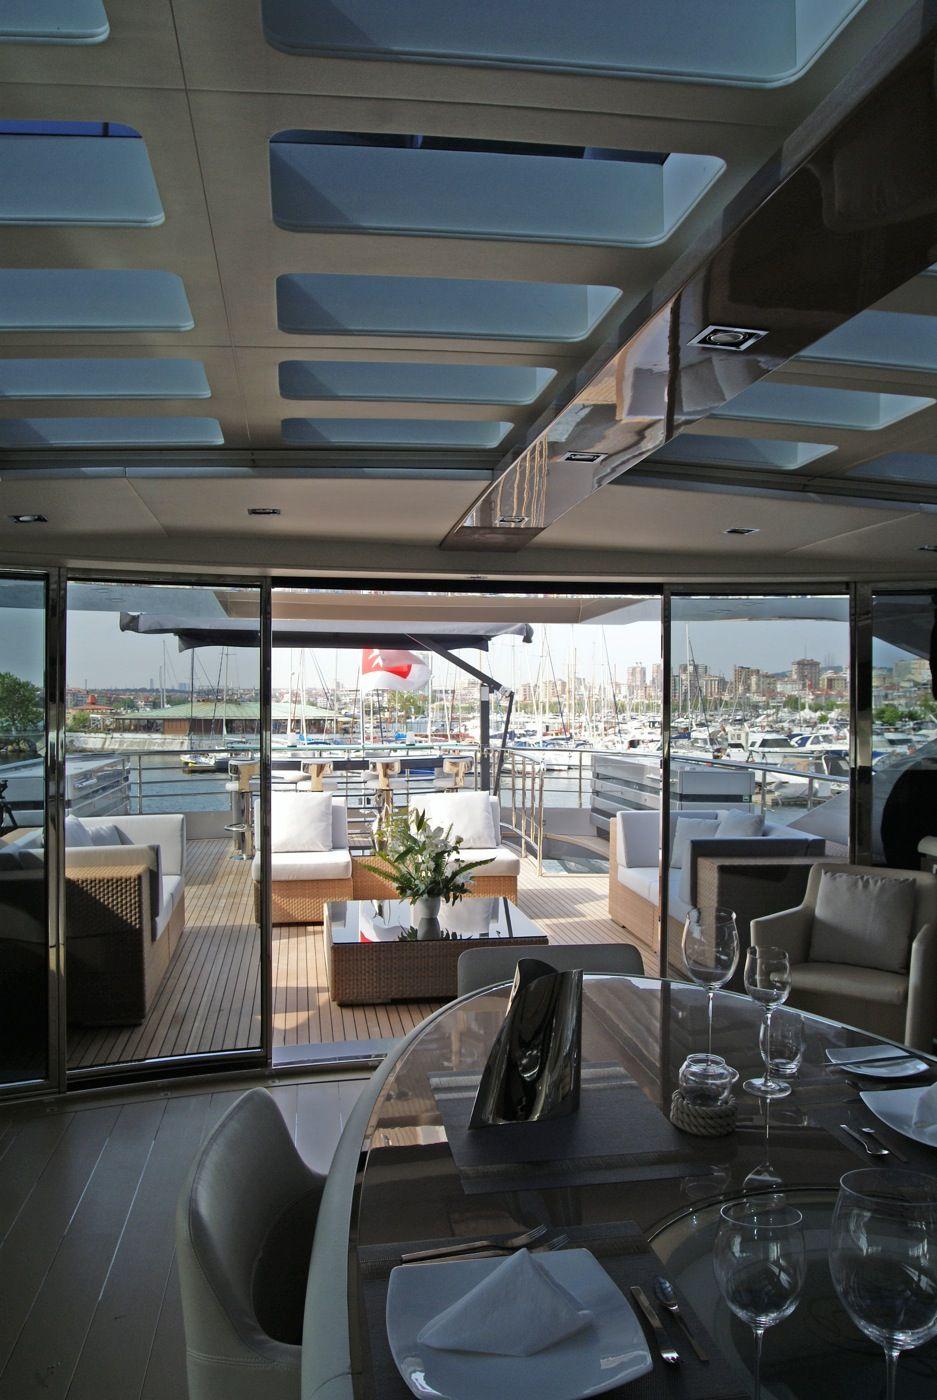 Luxury Yacht Engine Room: Mega Super Yacht Interior Design